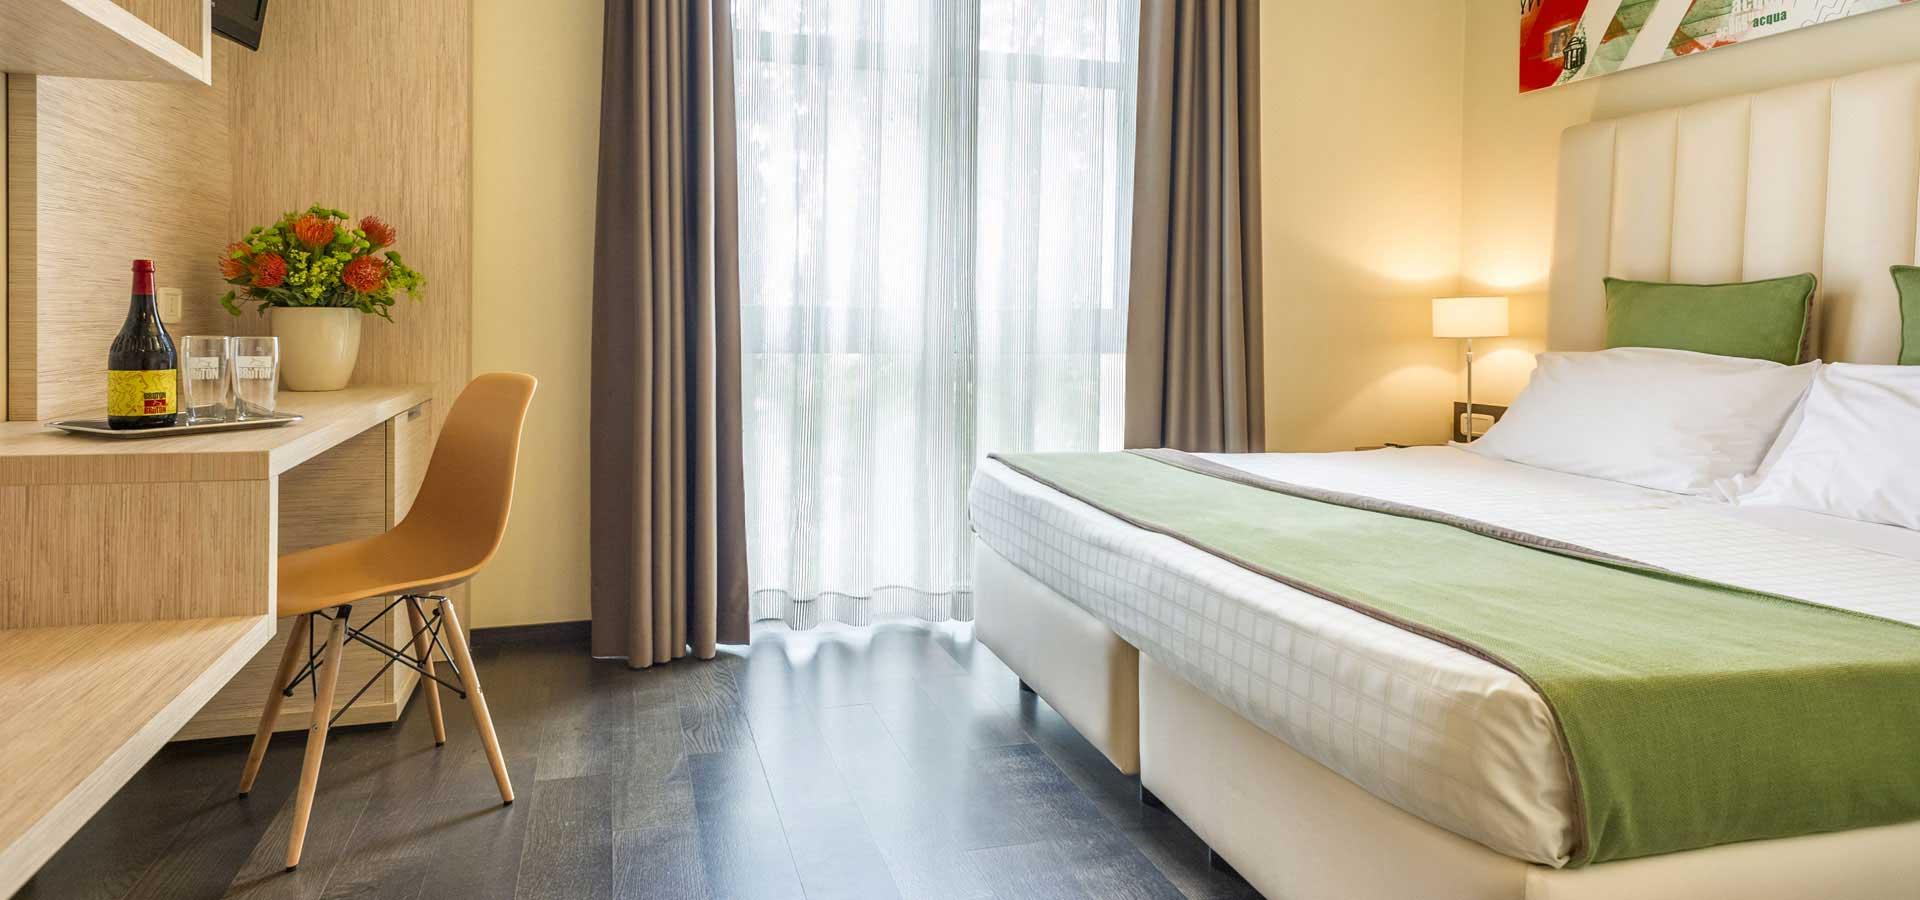 camera hotel 3 stelle